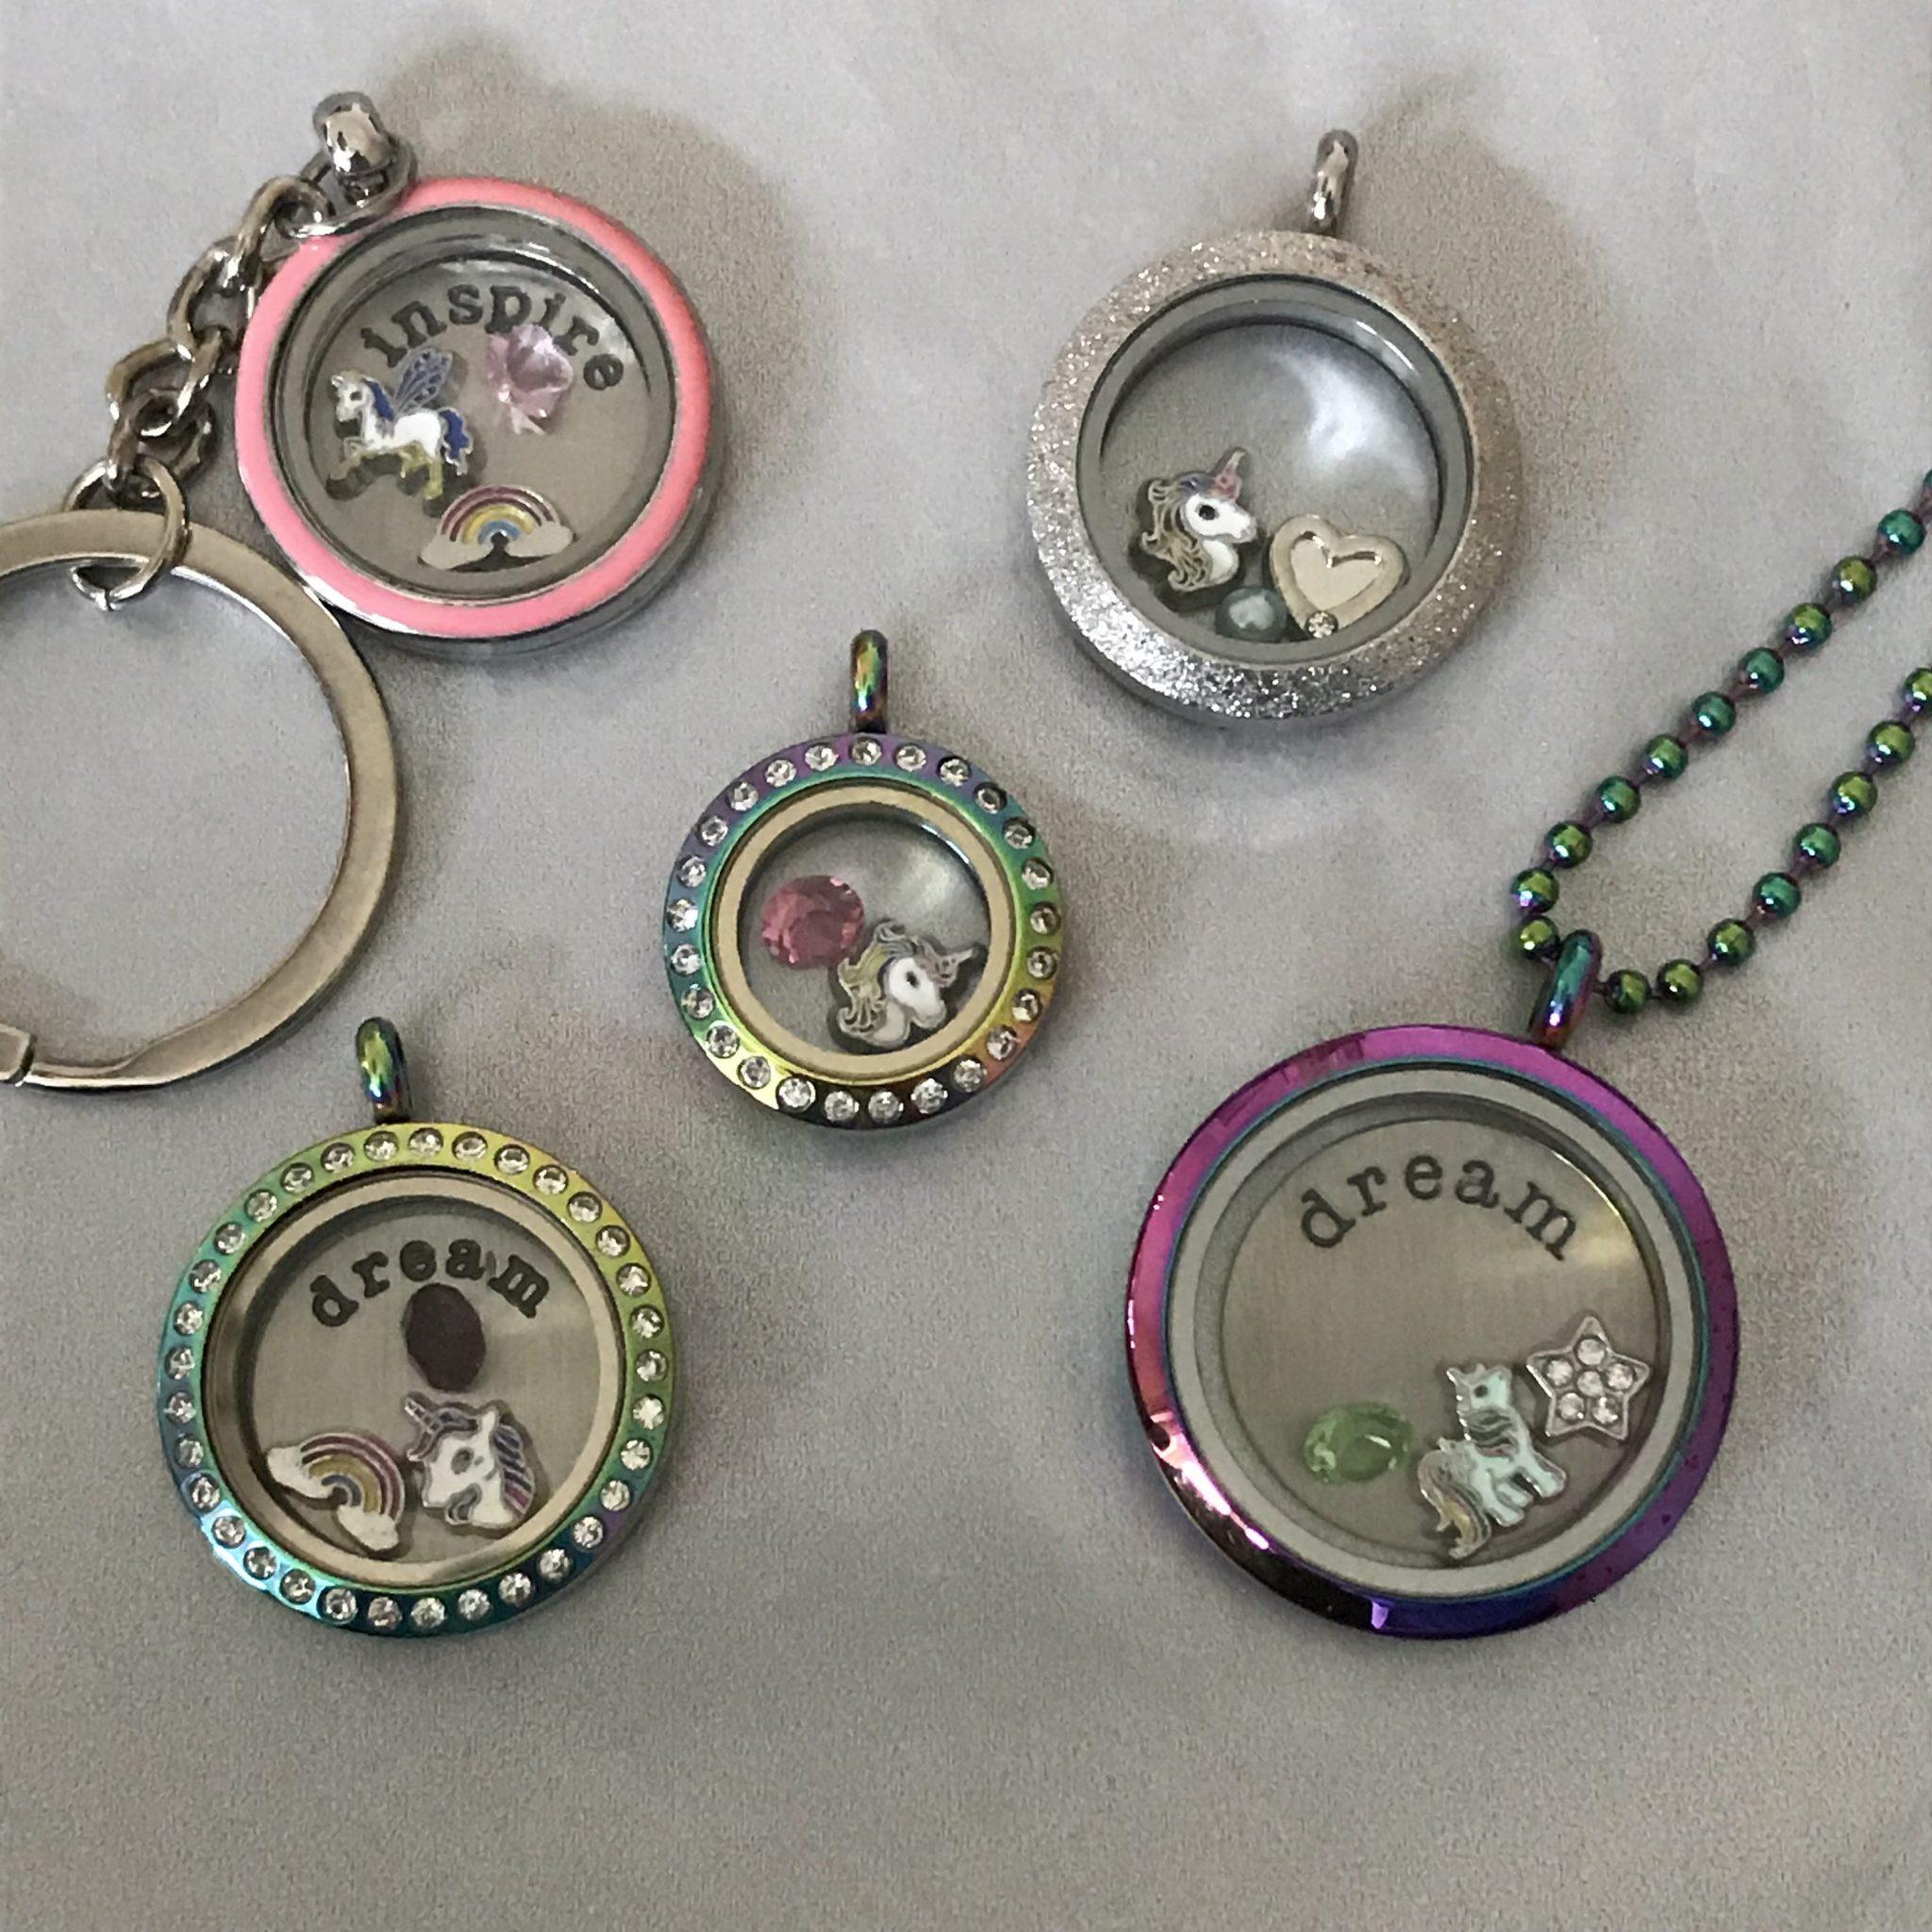 National Unicorn Day Unicorn Locket Collection